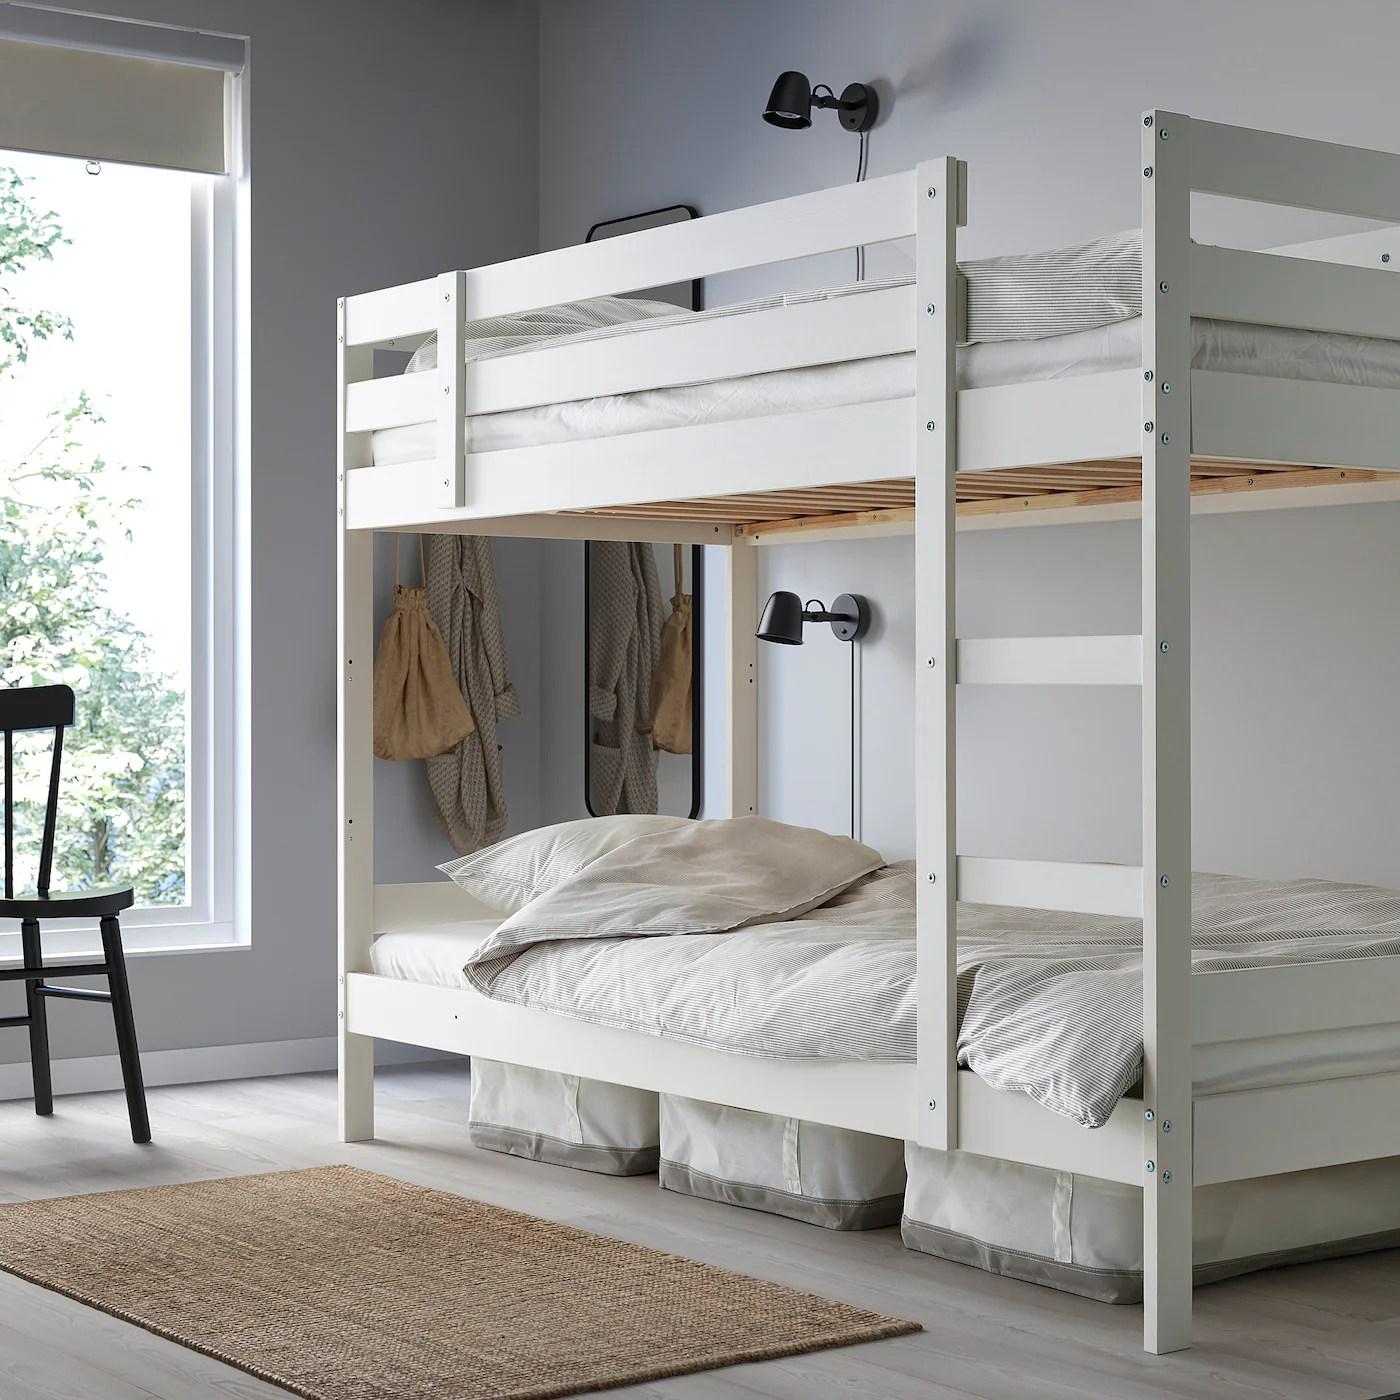 Mydal Structure Lits Superposes Blanc 90x200 Cm Ikea